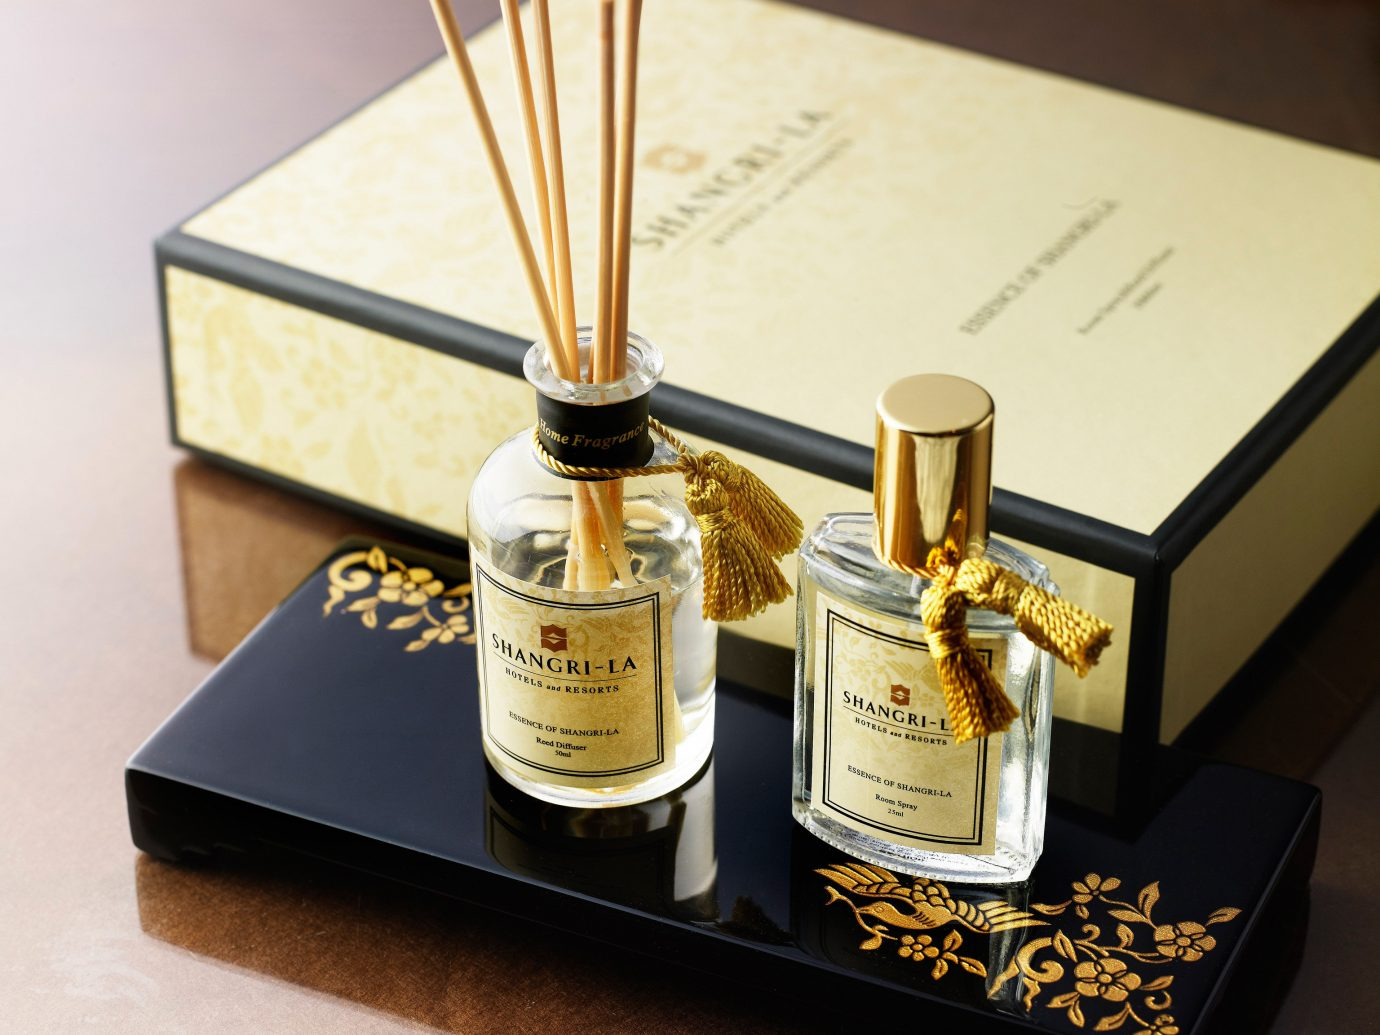 Hotels Luxury Travel table indoor perfume Beauty lighting cosmetics wine bottle flavor bottle